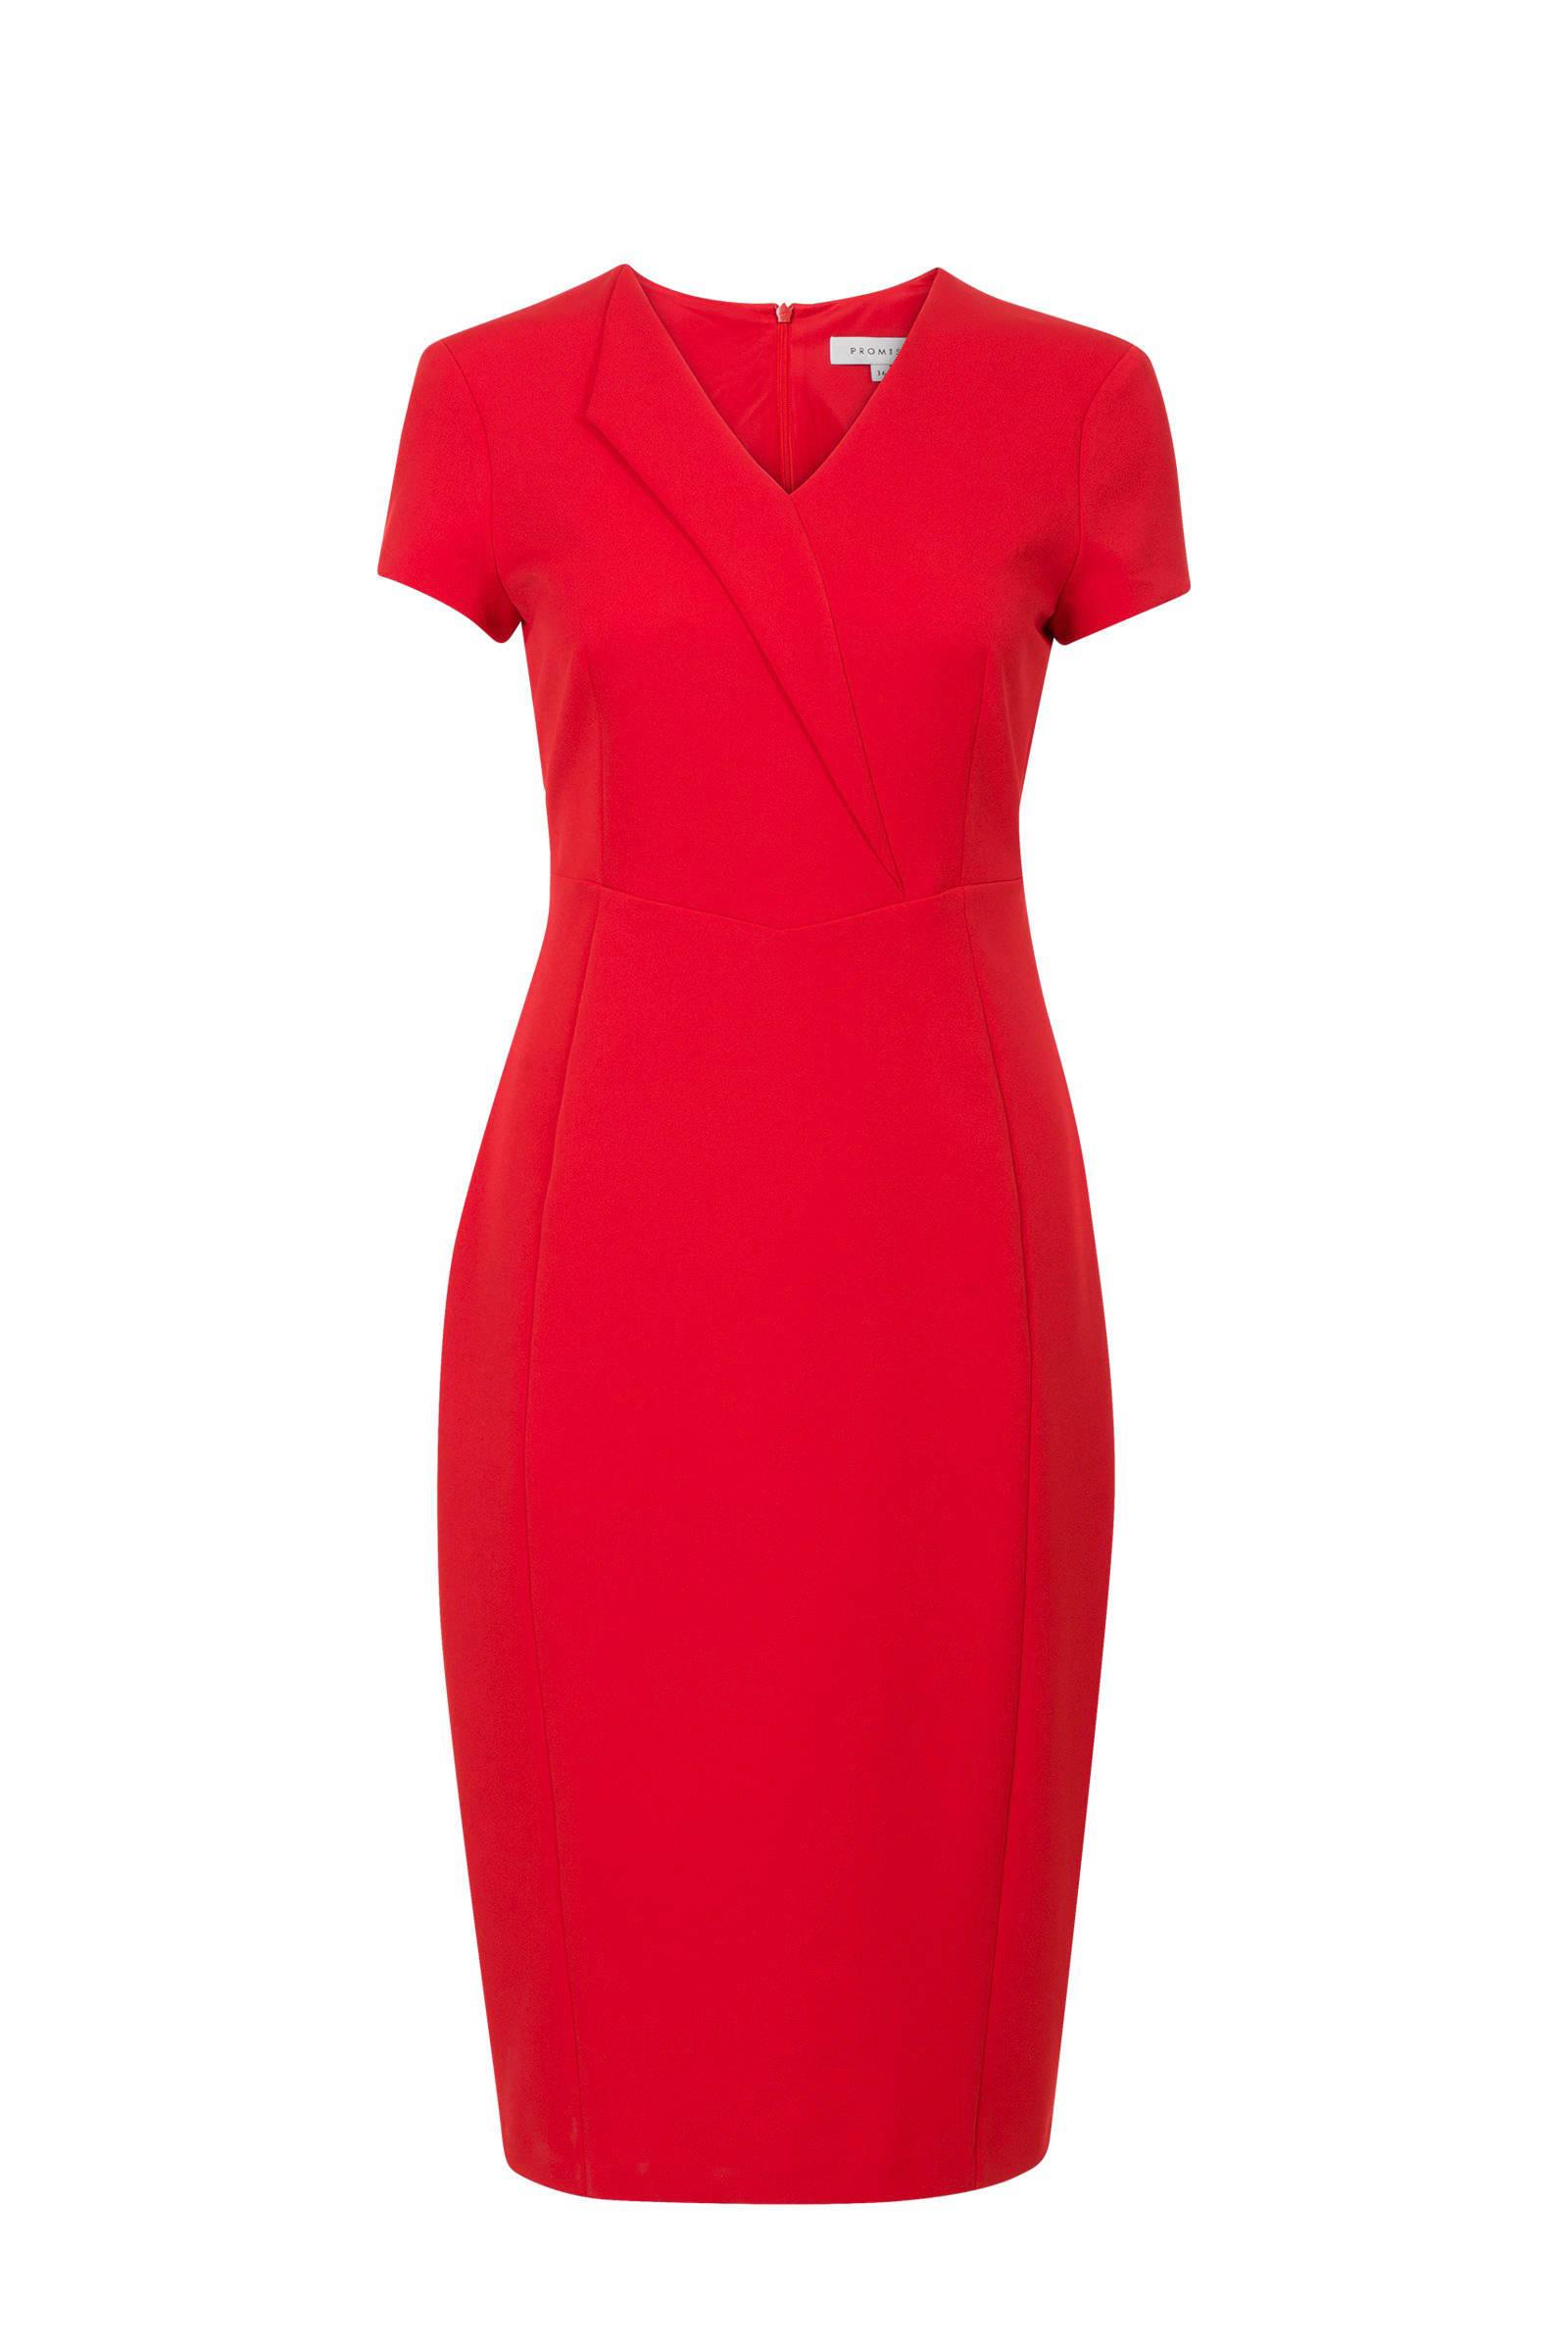 zakelijke jurk rood